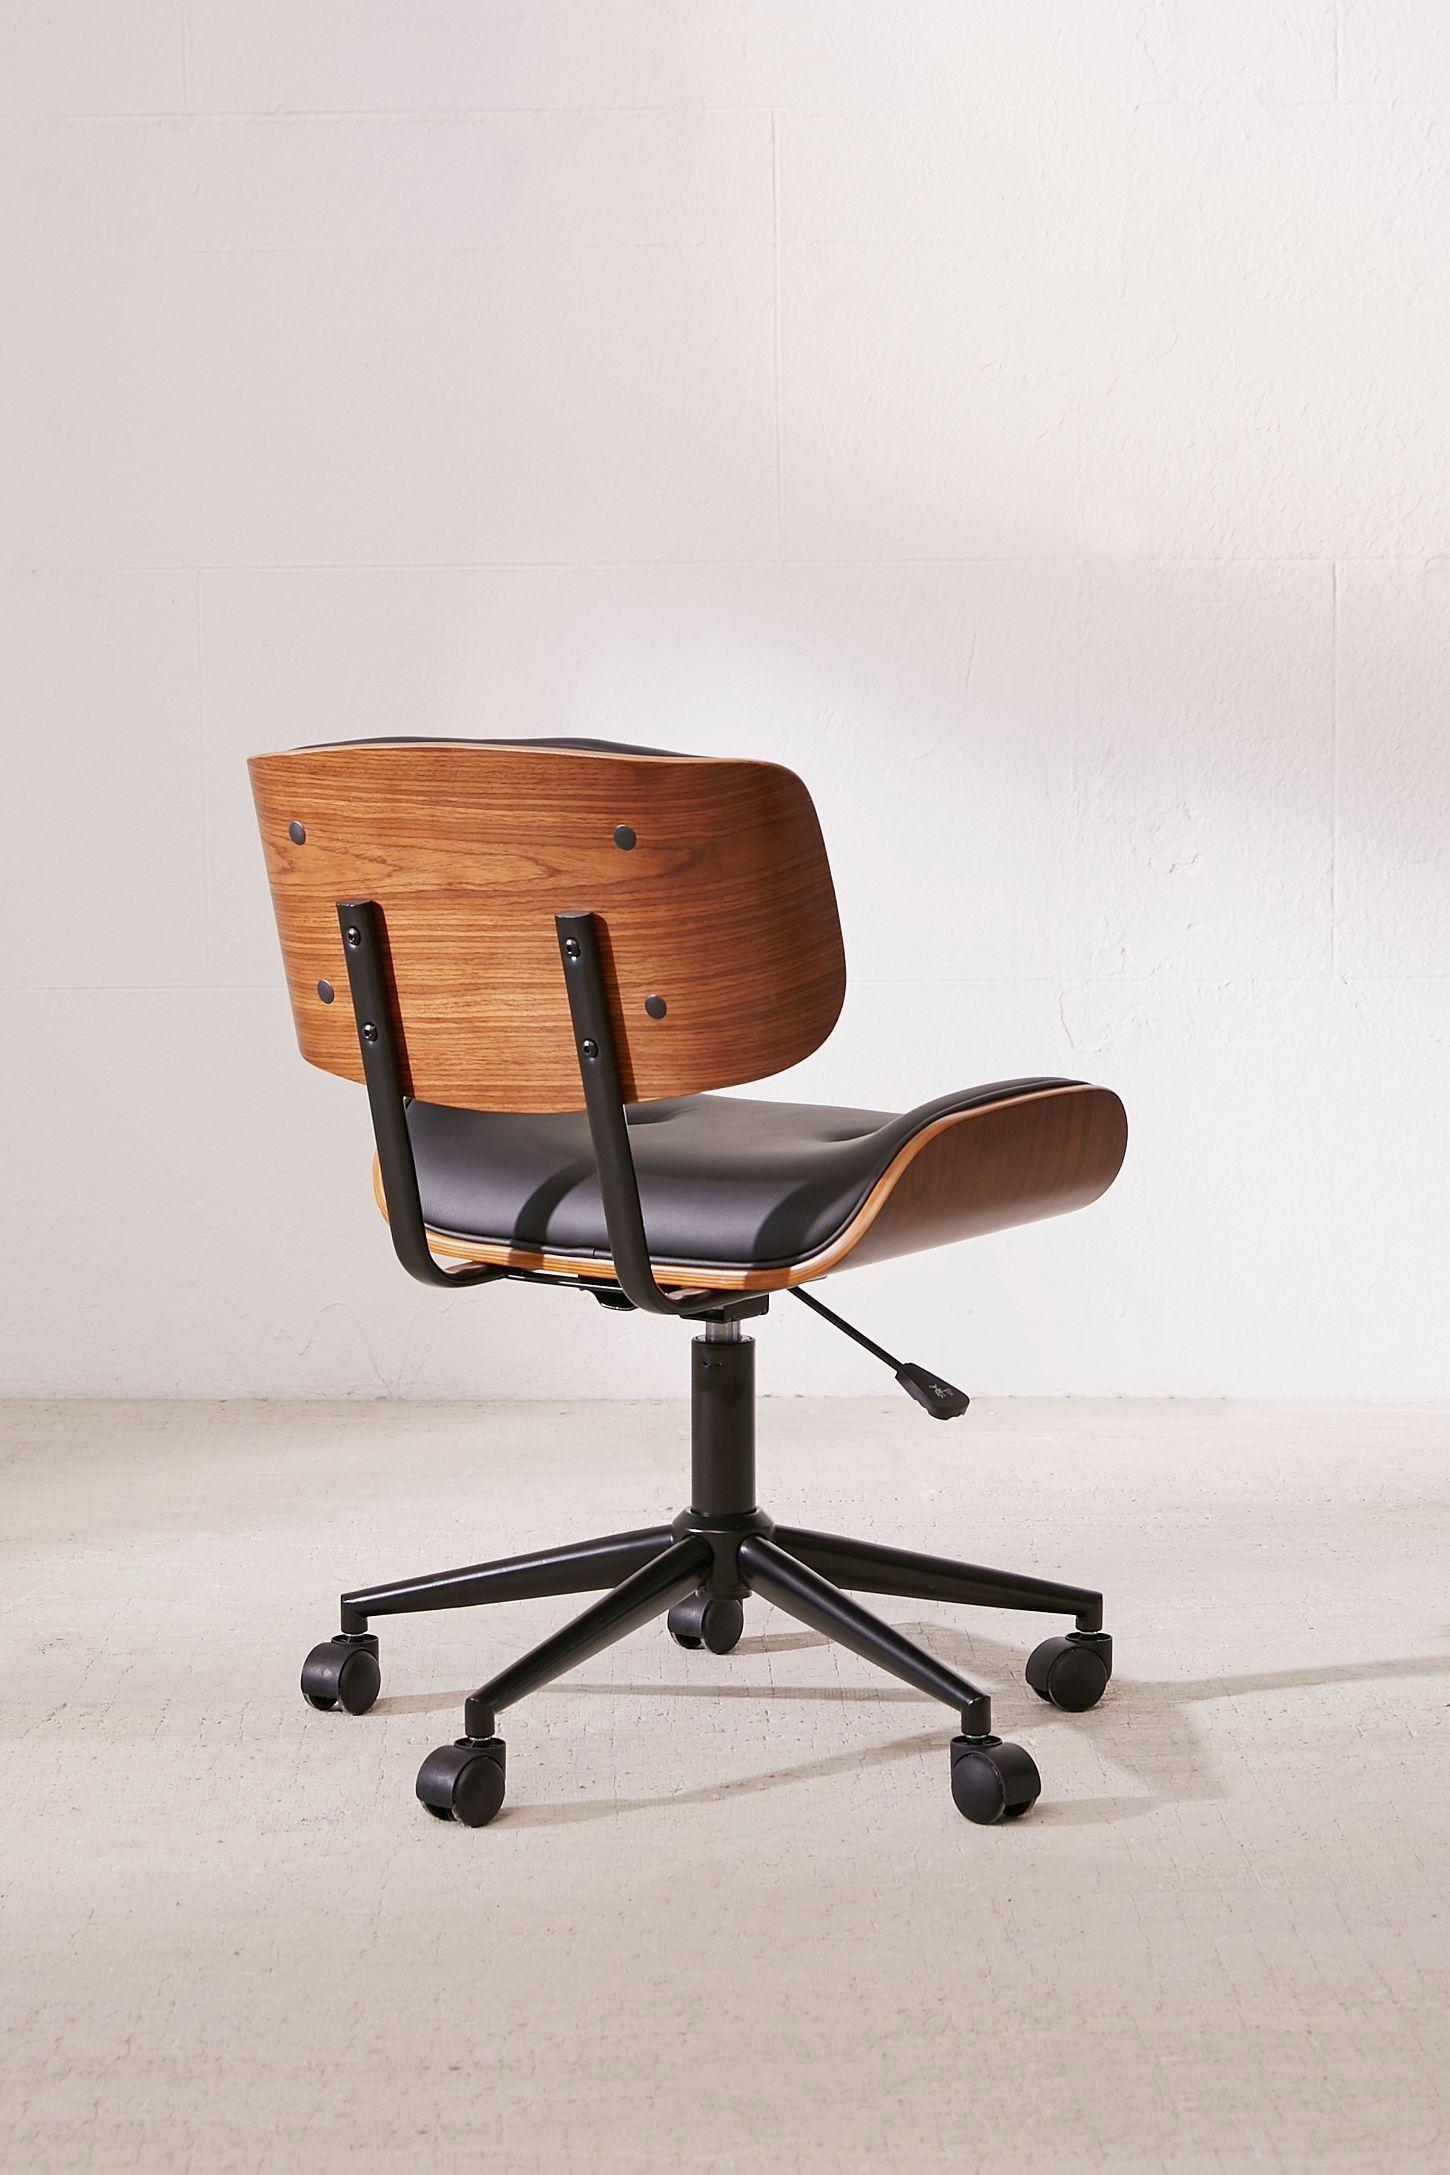 Best Diy Standing Desk Plan In 2020 Modern Desk Chair Desk Chair Diy Wood Desk Chair